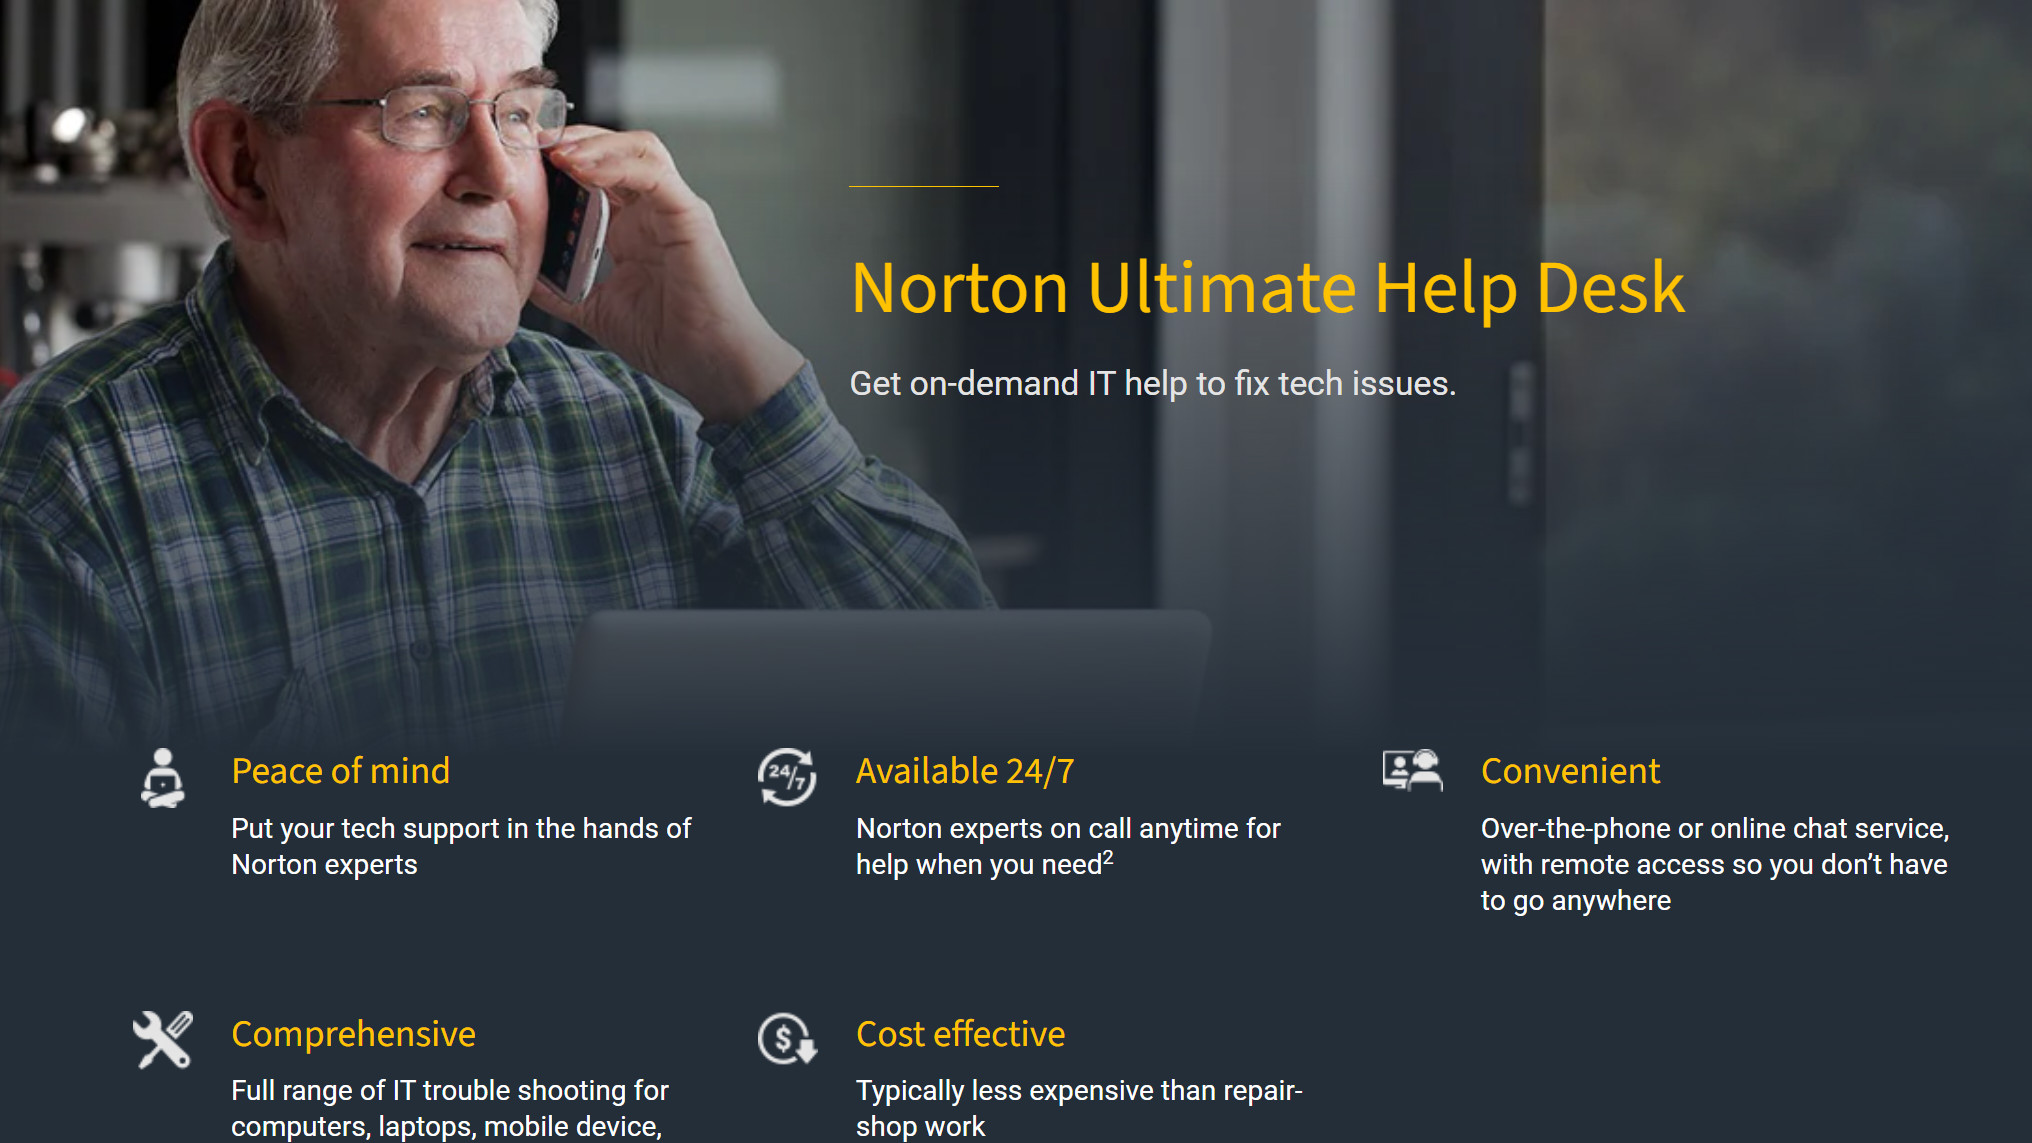 Norton Ultimate Help Desk website showing customer calling